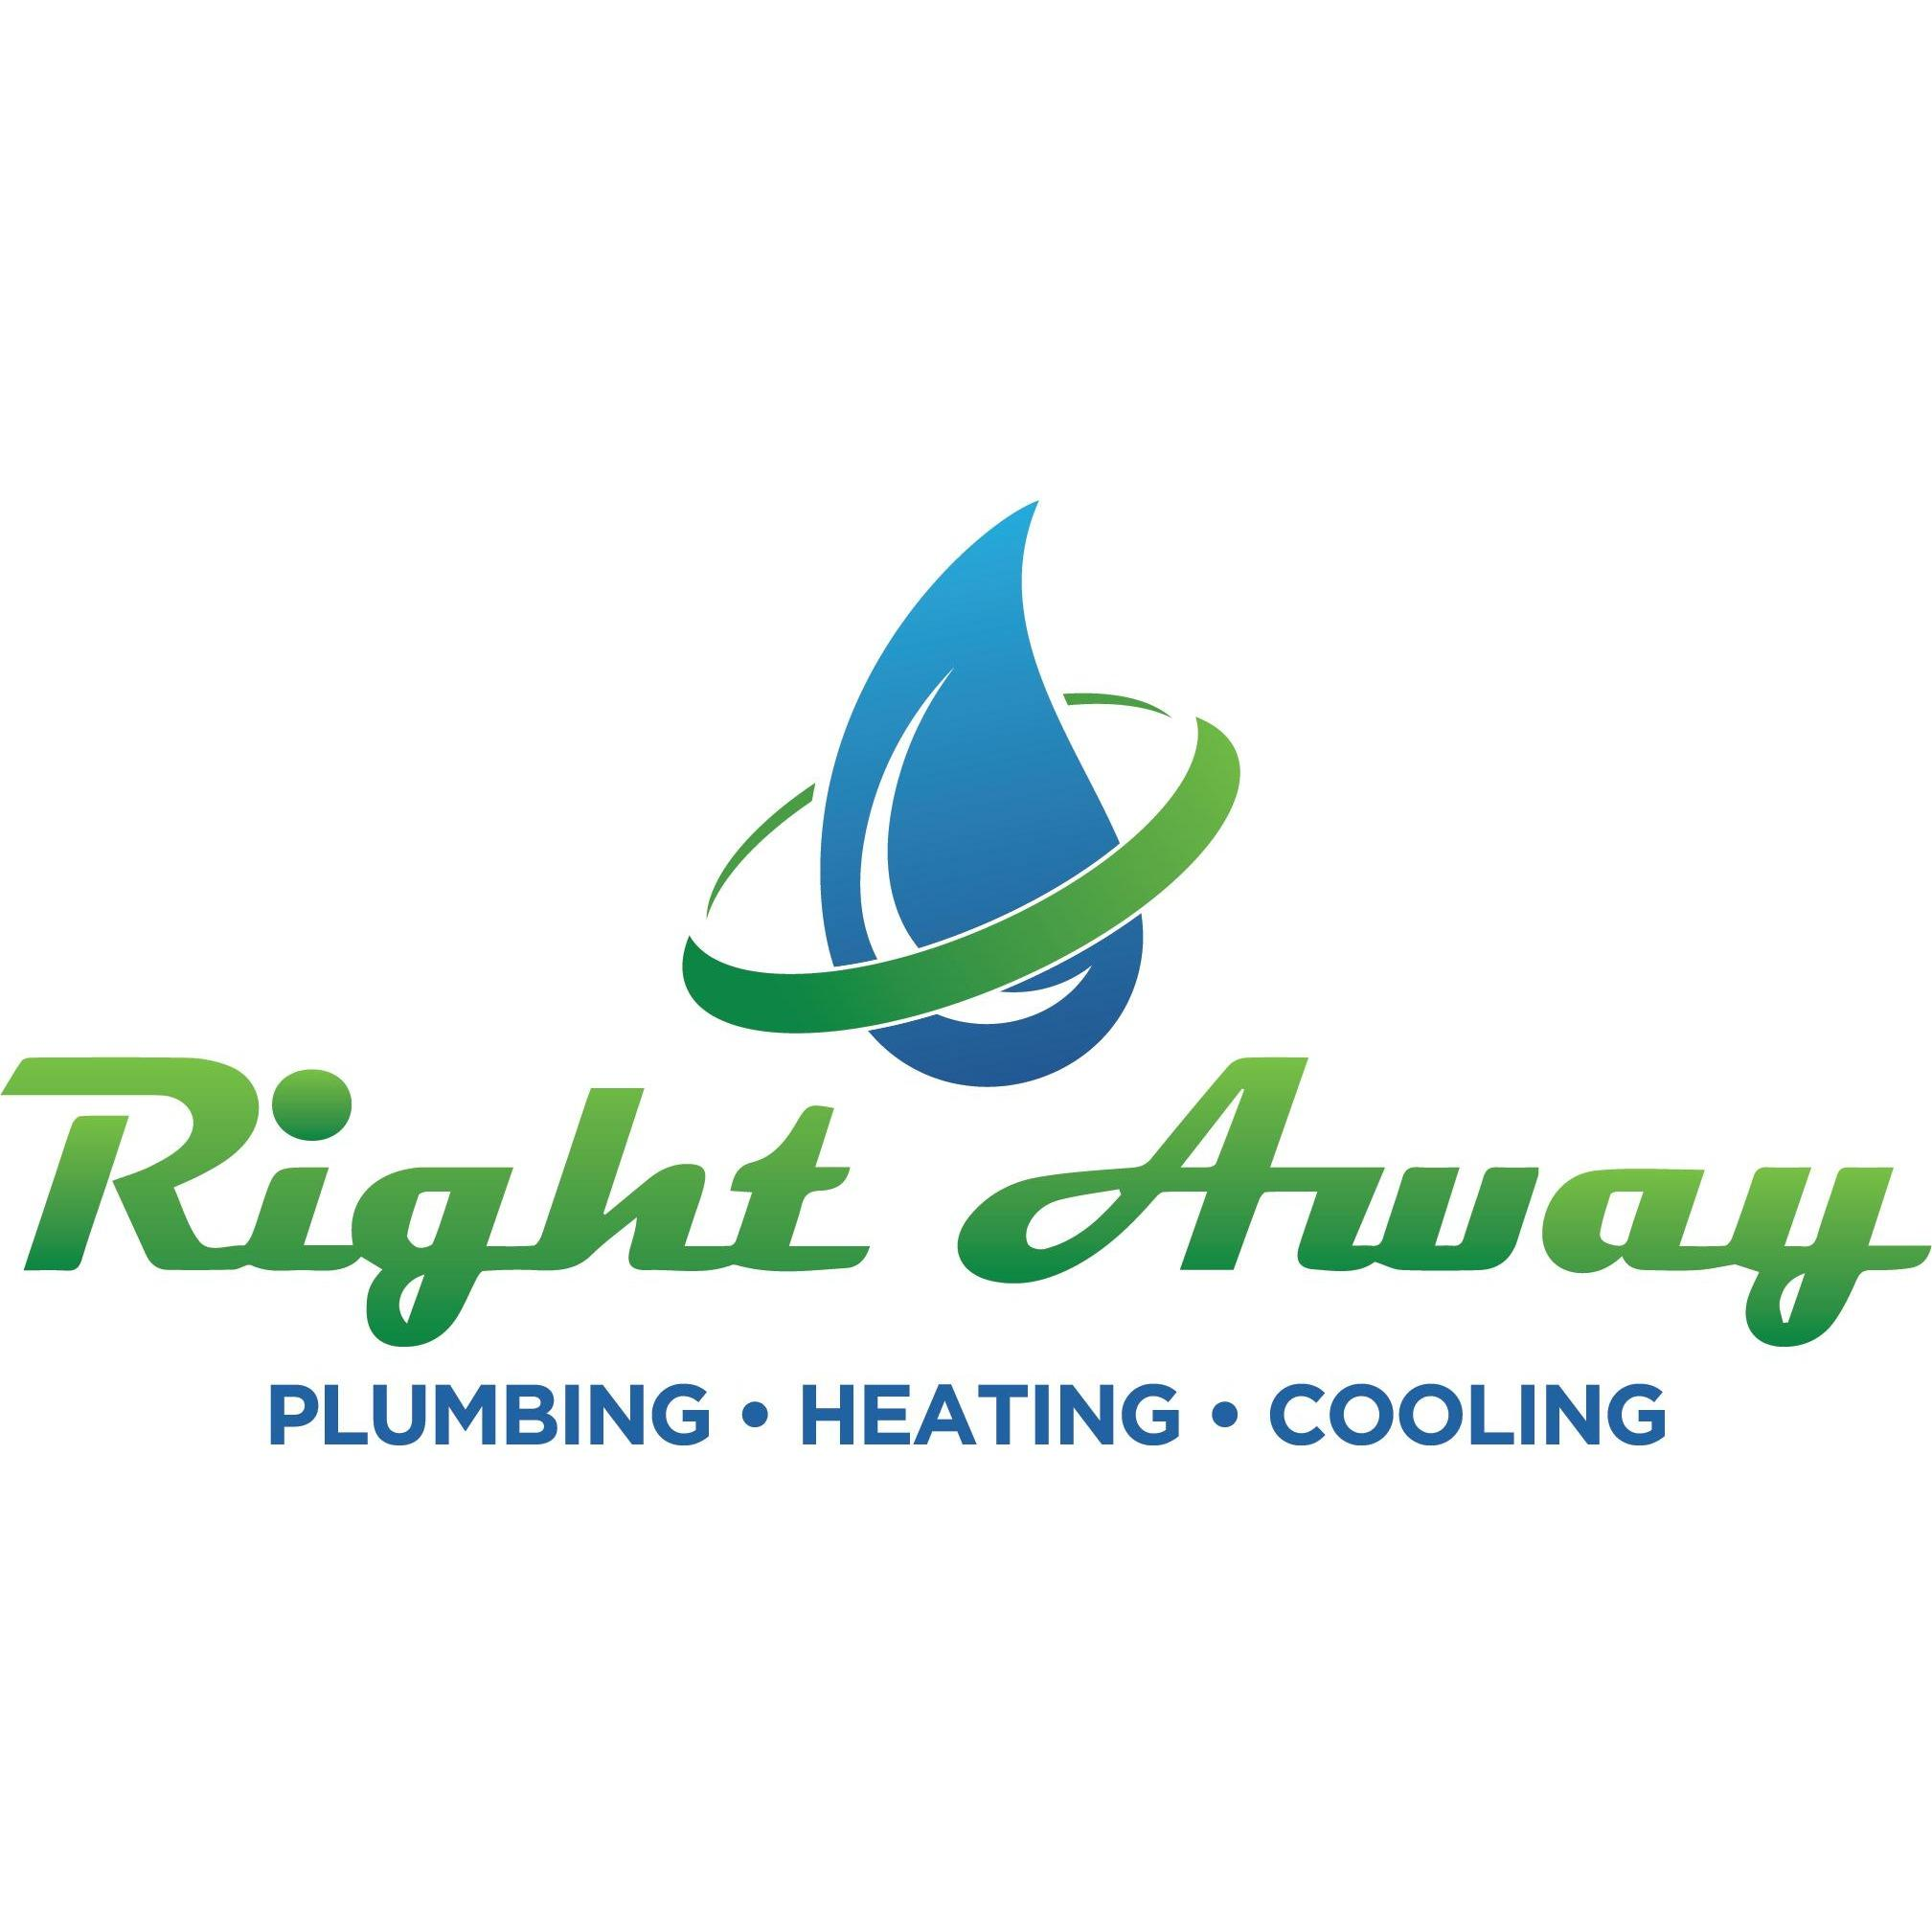 Right Away Plumbing and HVAC